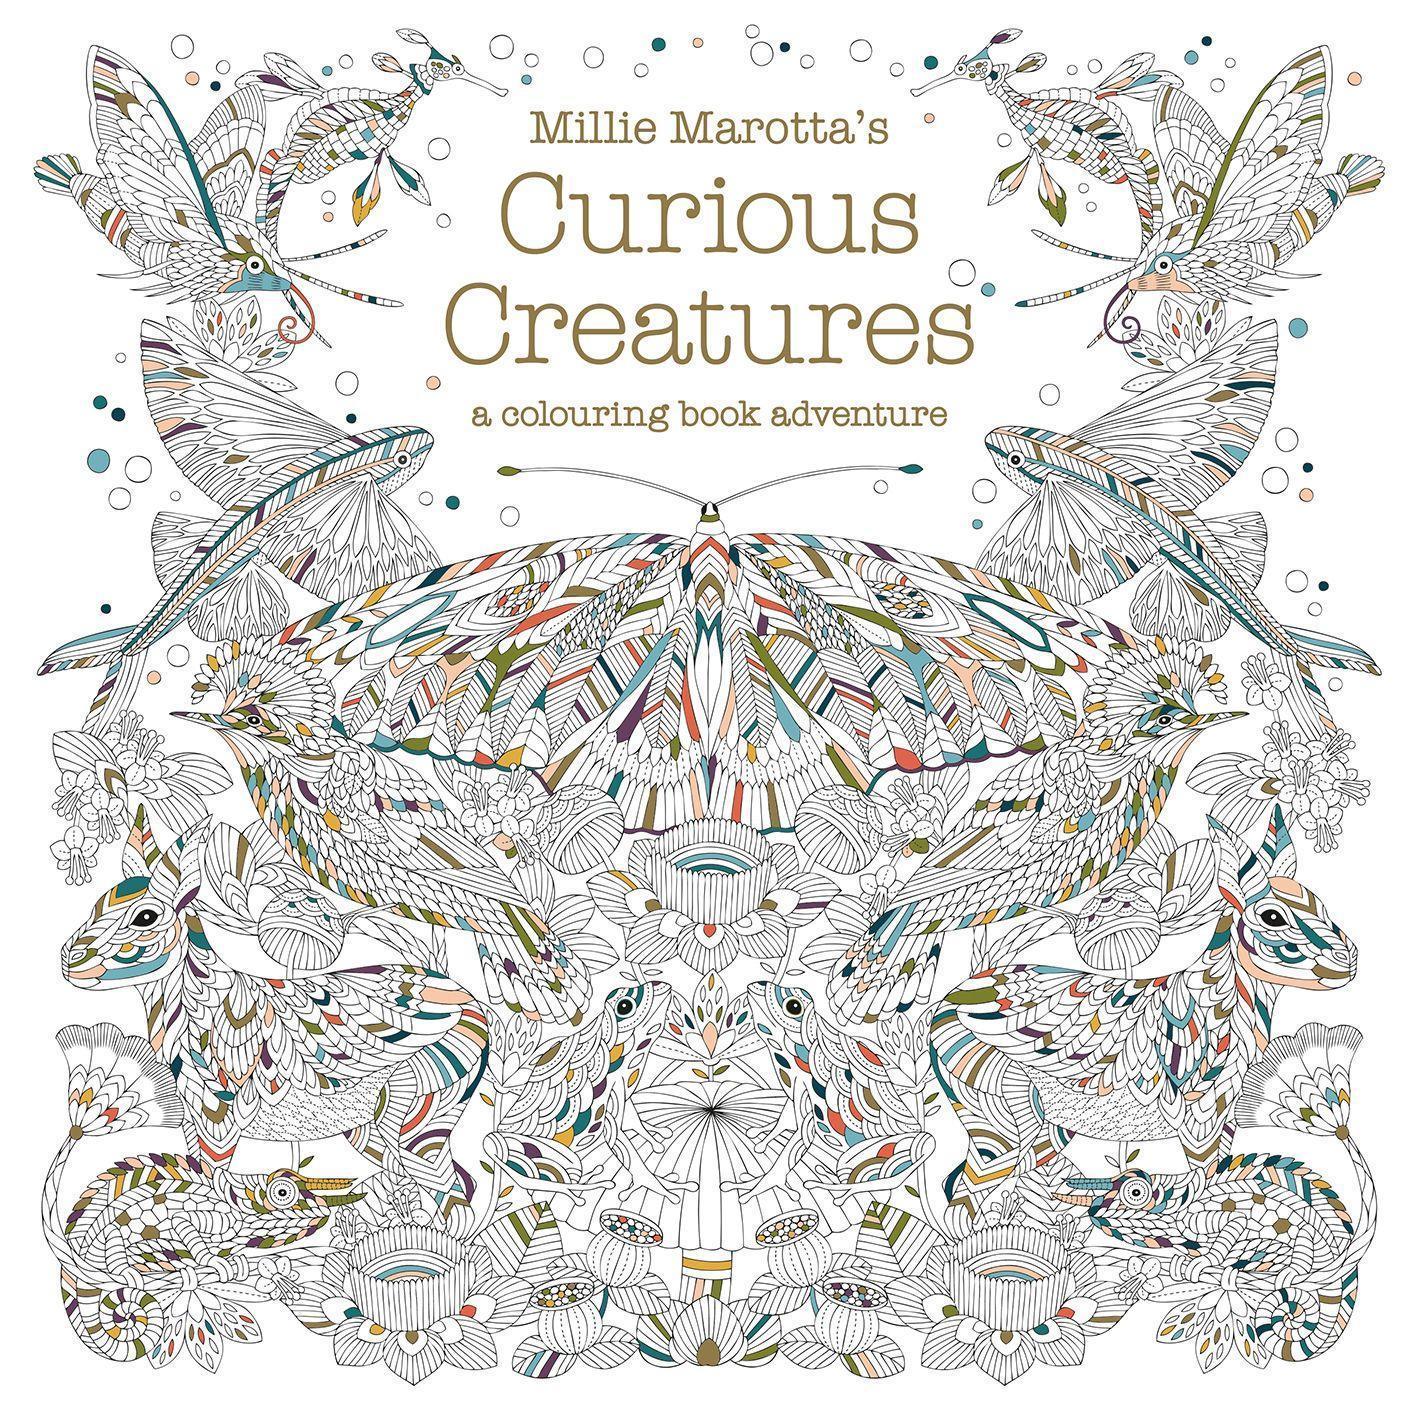 Millie-Marotta-039-s-Curious-Creatures-Millie-Marotta